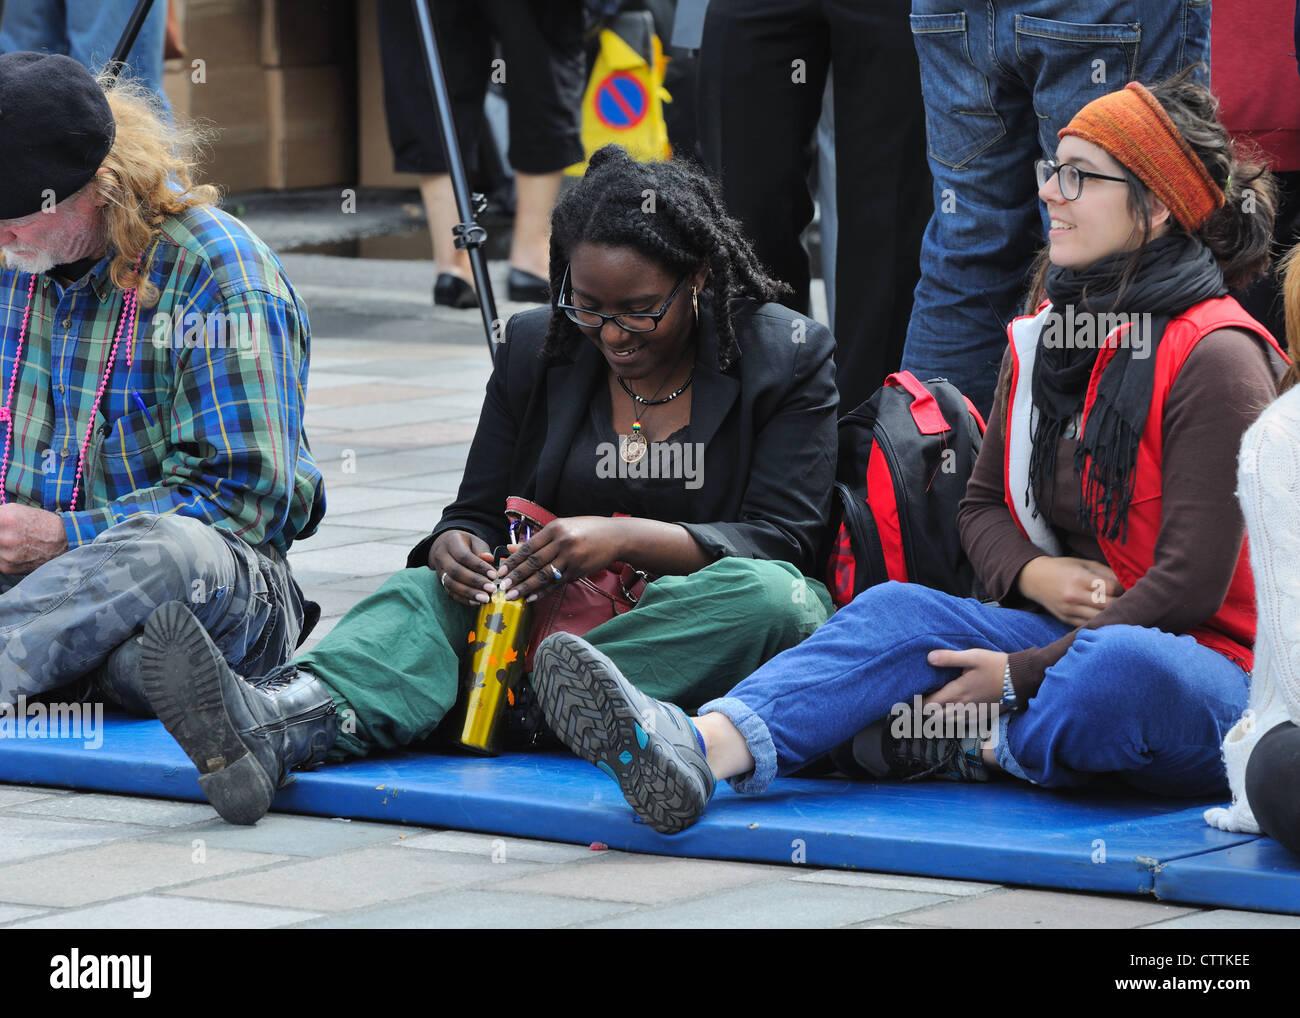 Spectators wait for street performance at the Merchant City Festival. - Stock Image